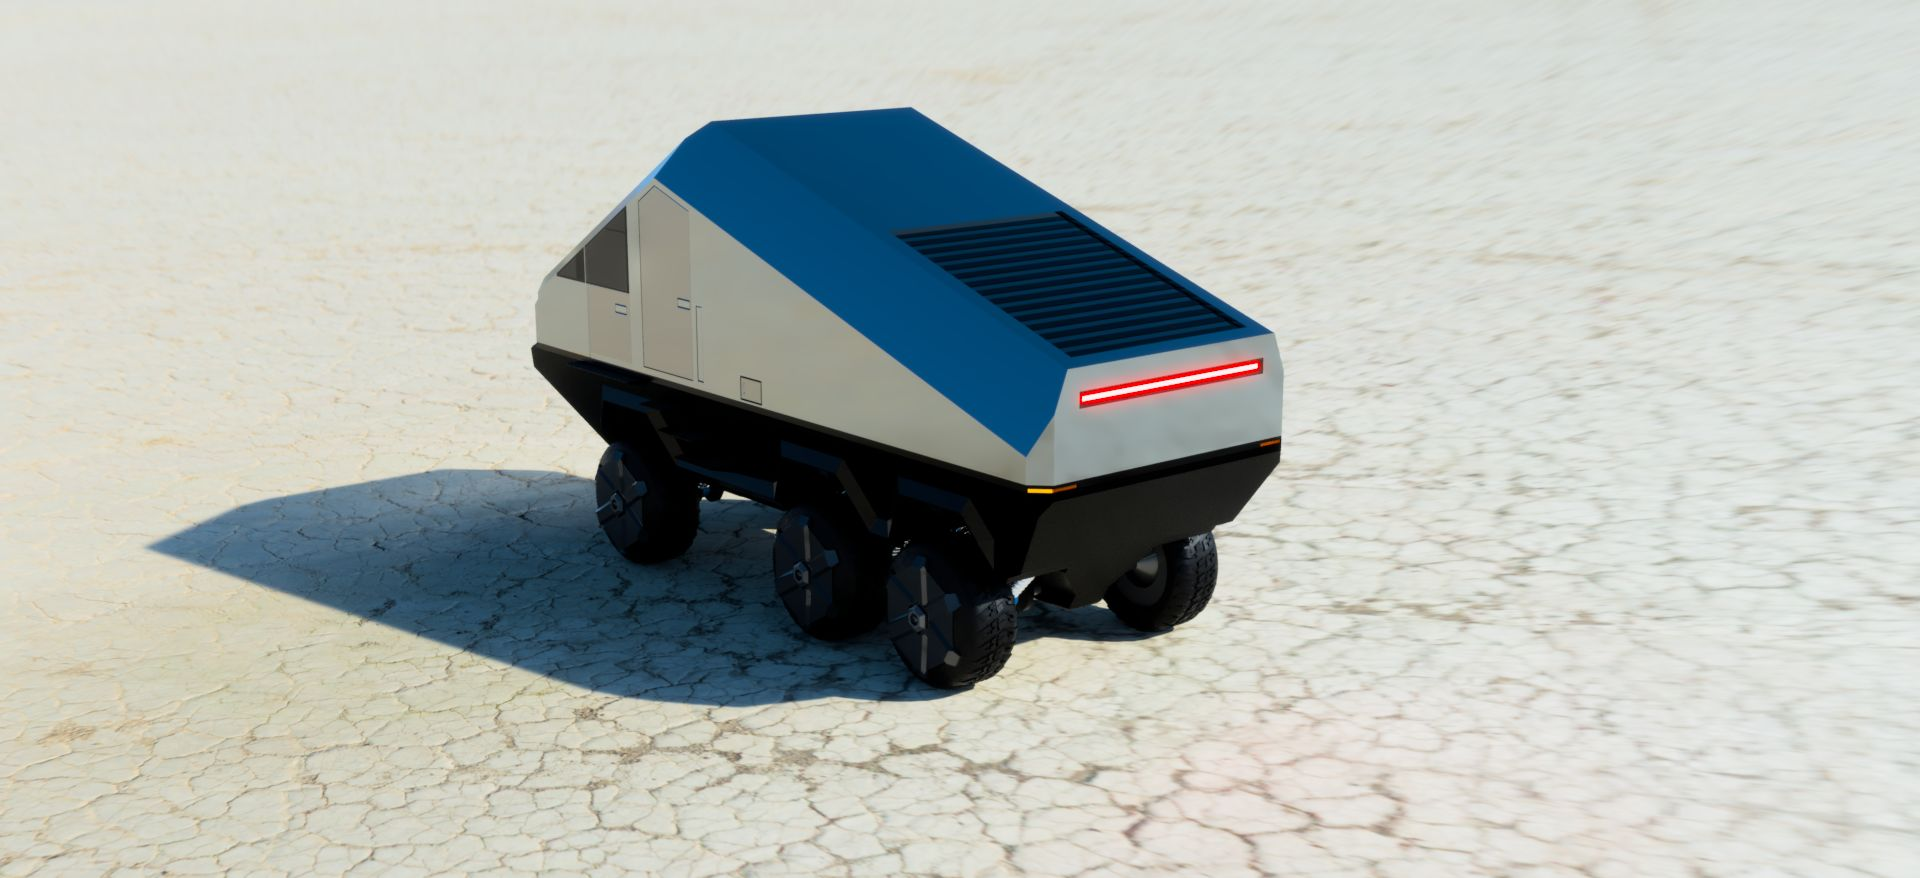 Tesla-semi-cybertruck-2020-apr-14-09-14-04am-000-customizedview25849920521-png-3500-3500